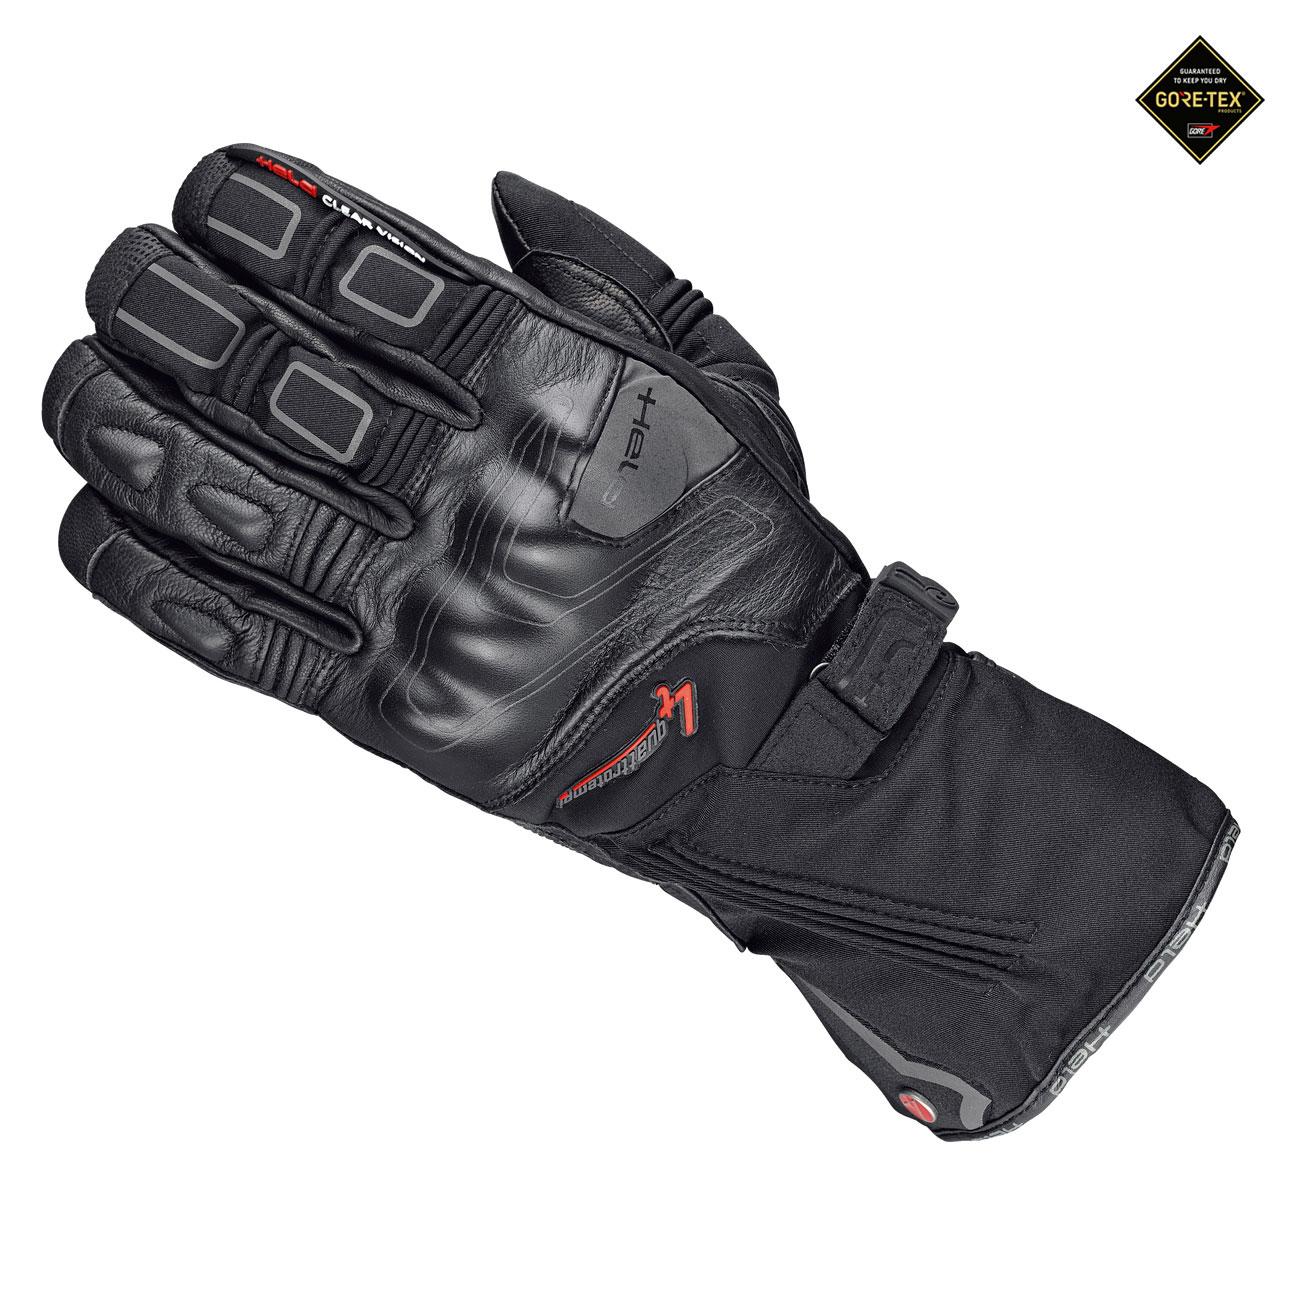 Held Cold Champ Gore-Tex + Gore Grip Technology Guantes De Moto Negro 11